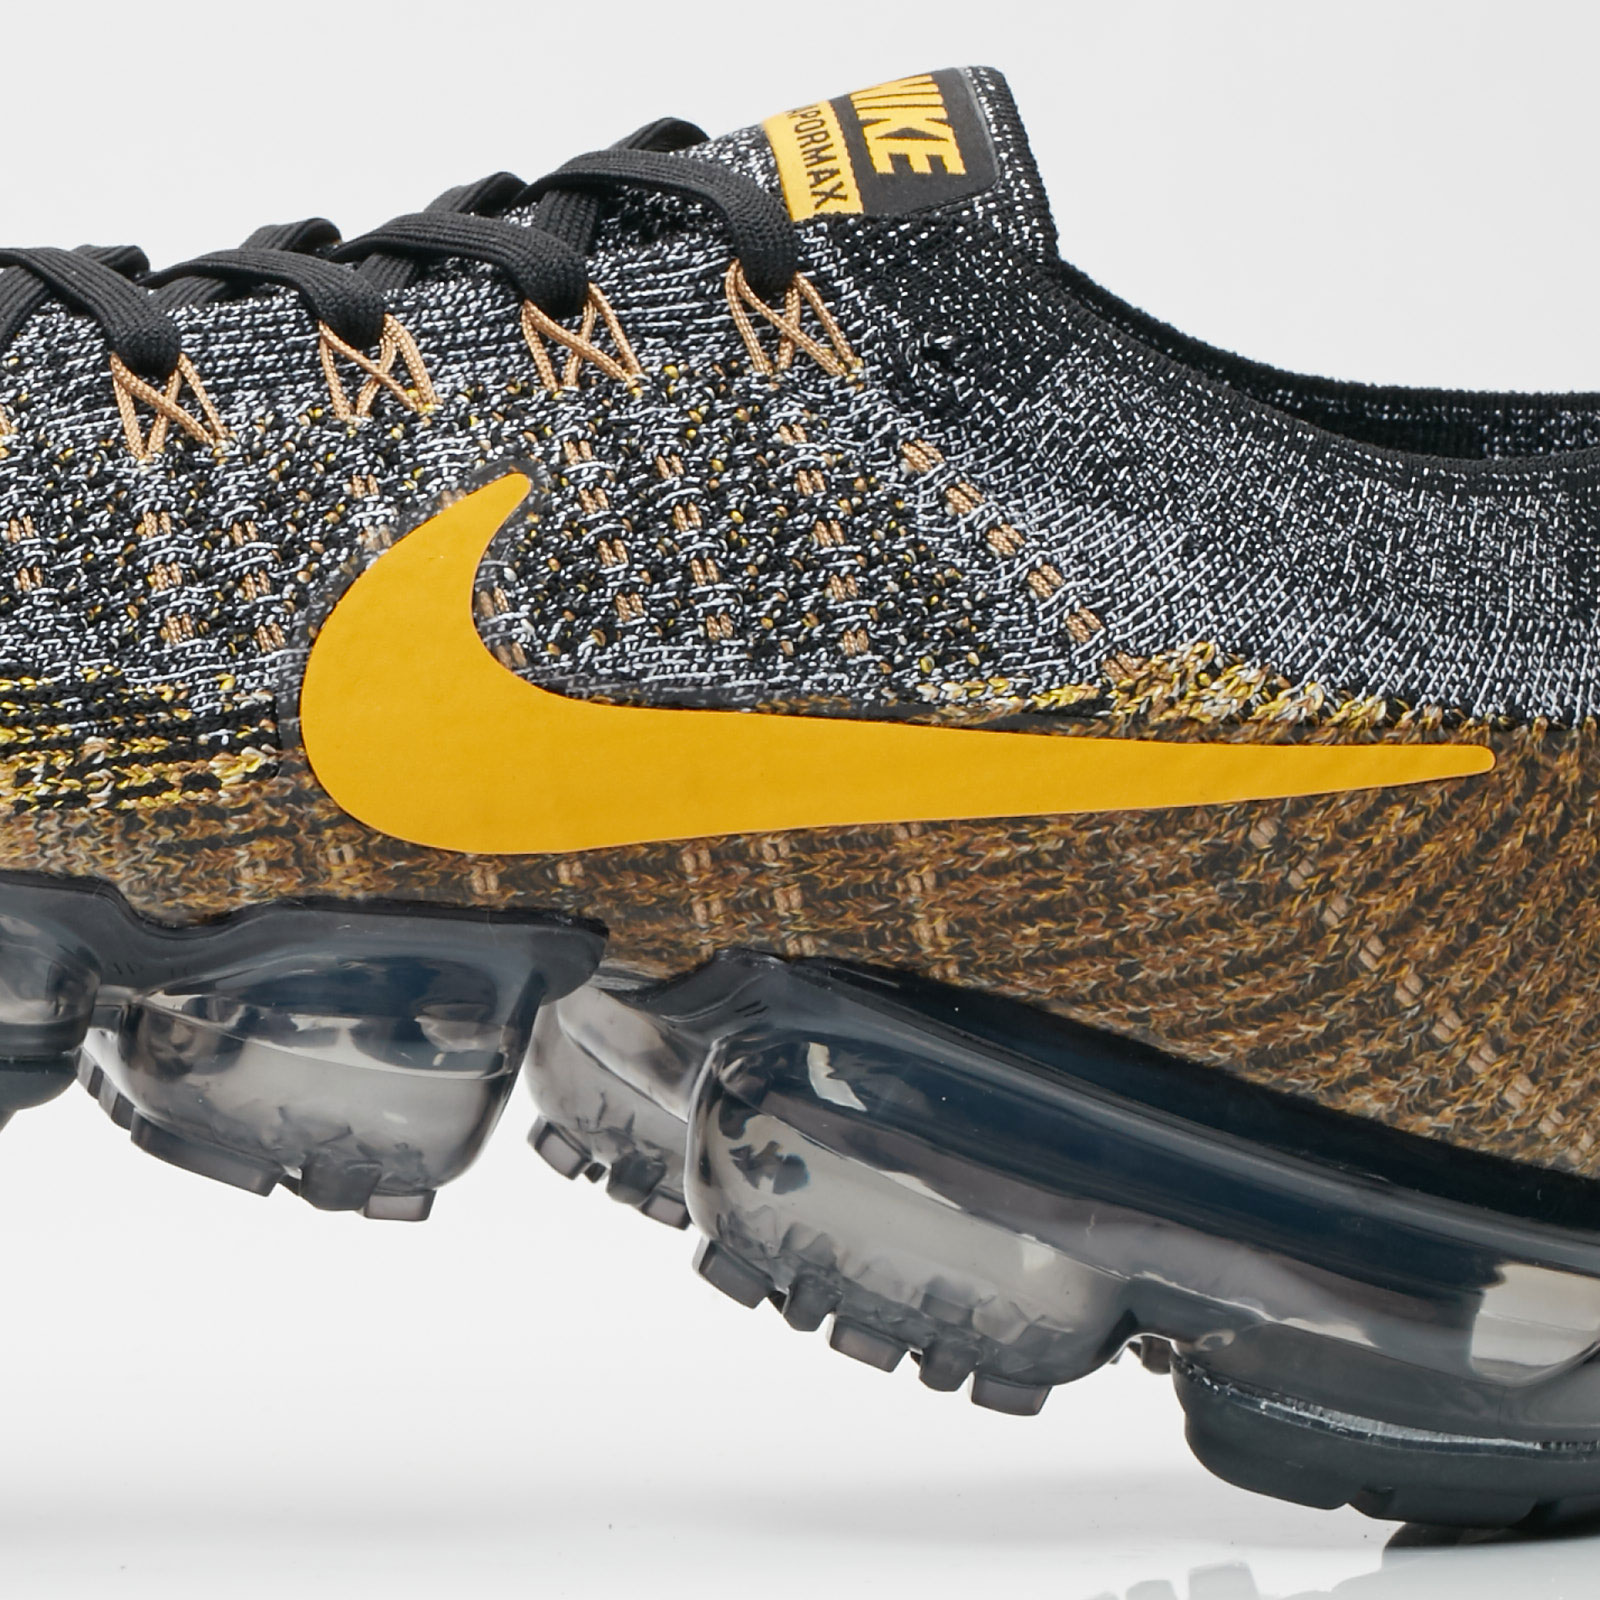 5fb055a902dc0 Nike Air Vapormax Flyknit - 849558-021 - Sneakersnstuff